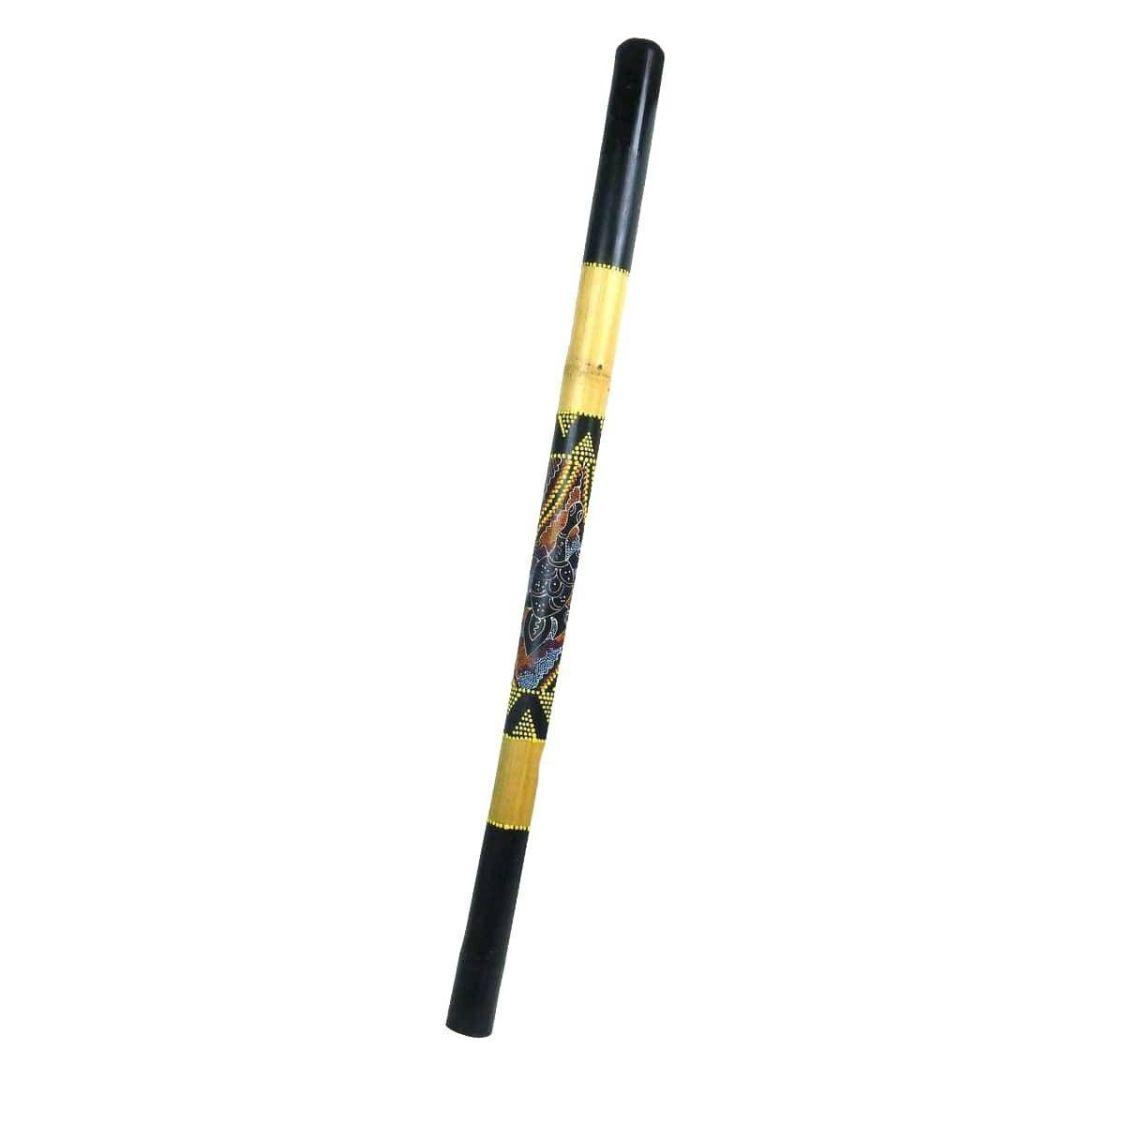 Didgeridoo Bambus Holz Aborigini bemalt geschnitzt Instrument fair Dot Painting